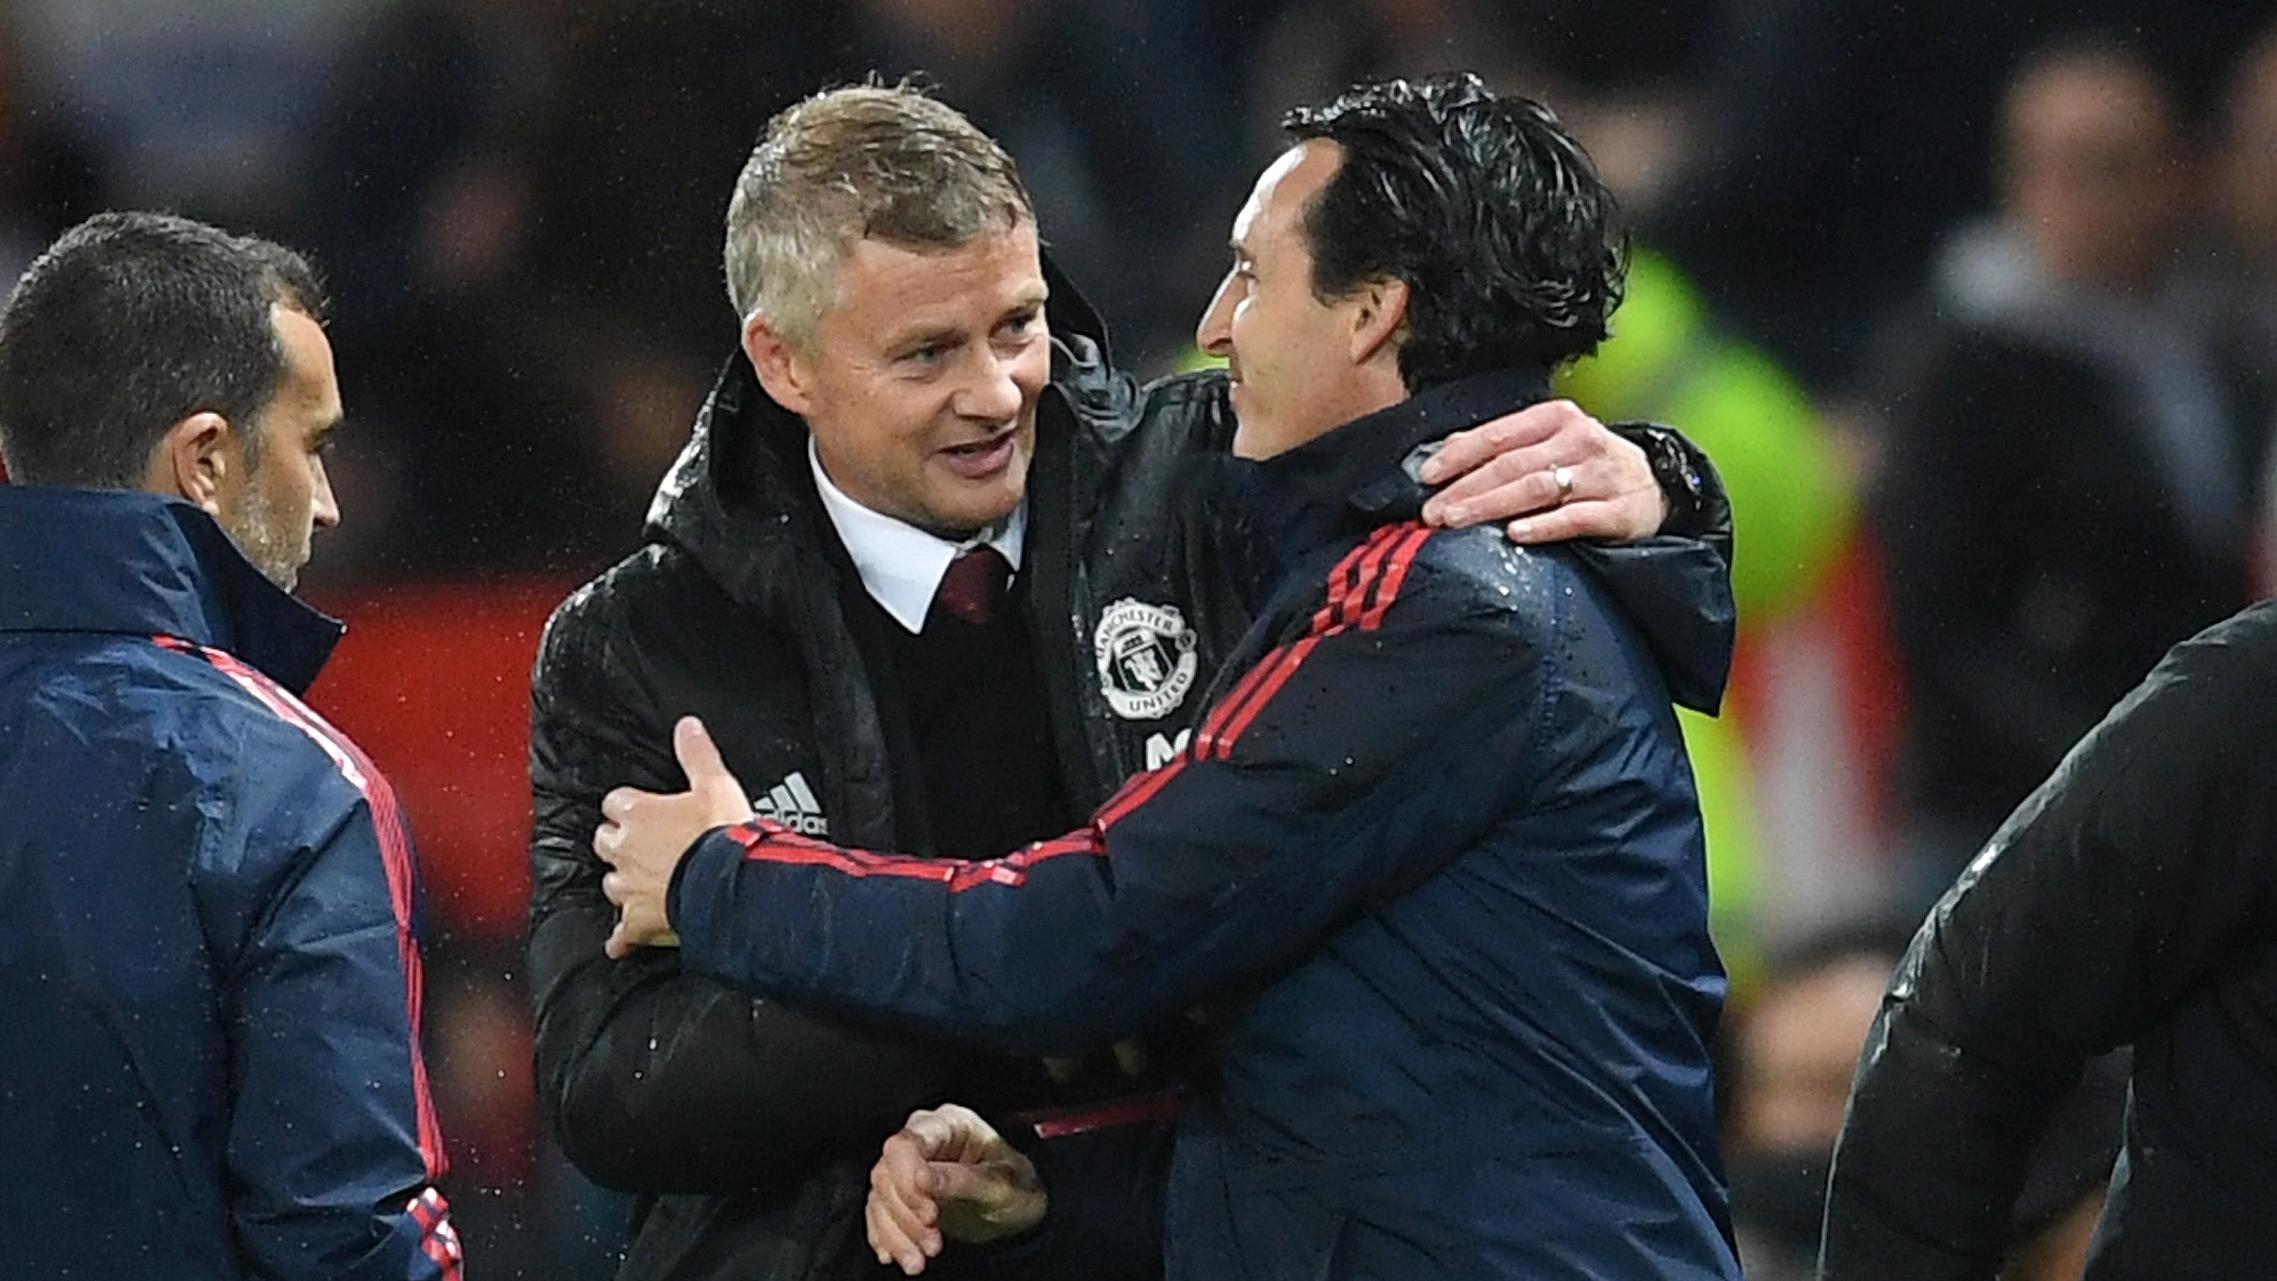 Solskjaer v Emery: Is the Man Utd manager or Arsenal coach worse? | Goal.com